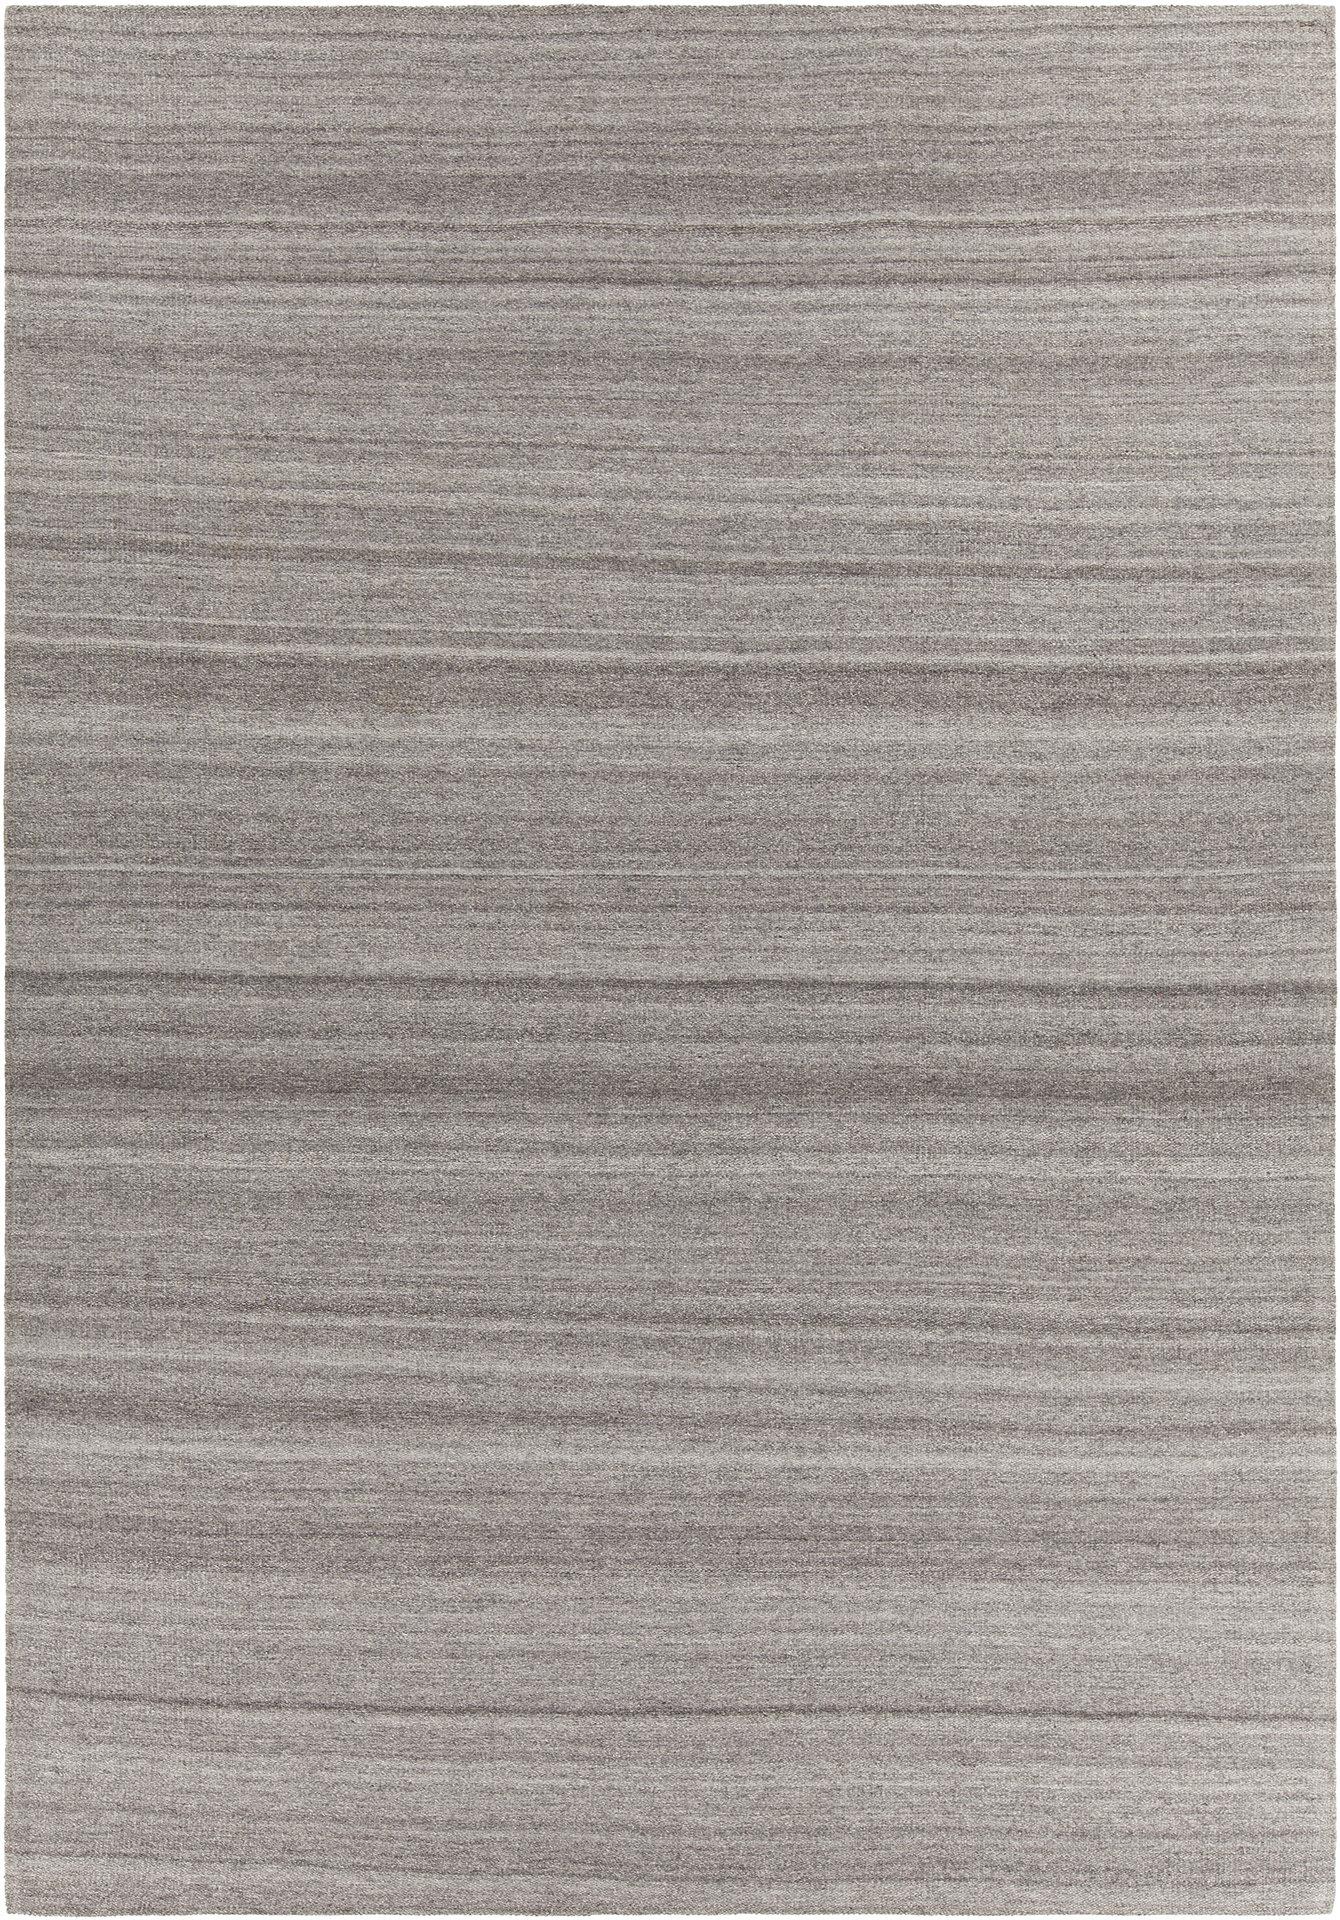 Chandra Datto Textured Cotemporary Dark Gray Area Rug Perigold